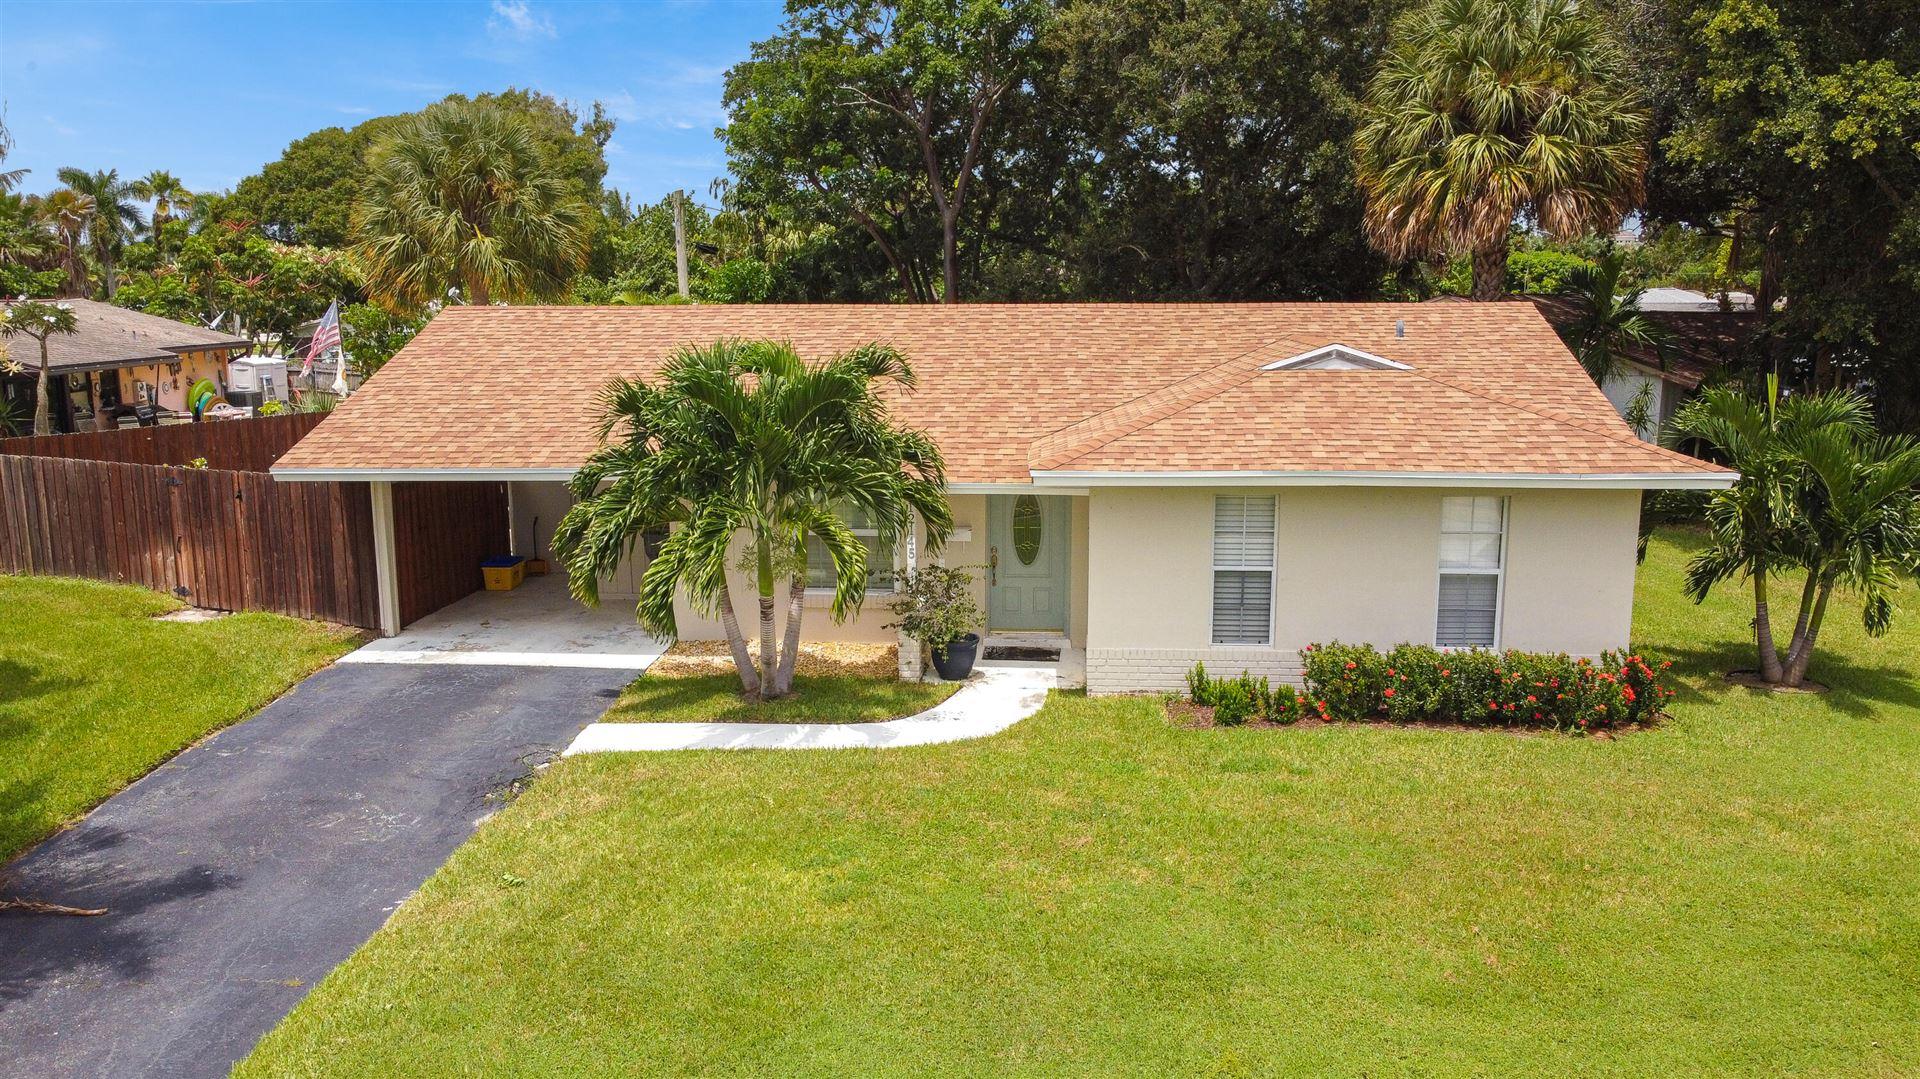 Photo of 12145 Easterly Avenue, Palm Beach Gardens, FL 33410 (MLS # RX-10742066)